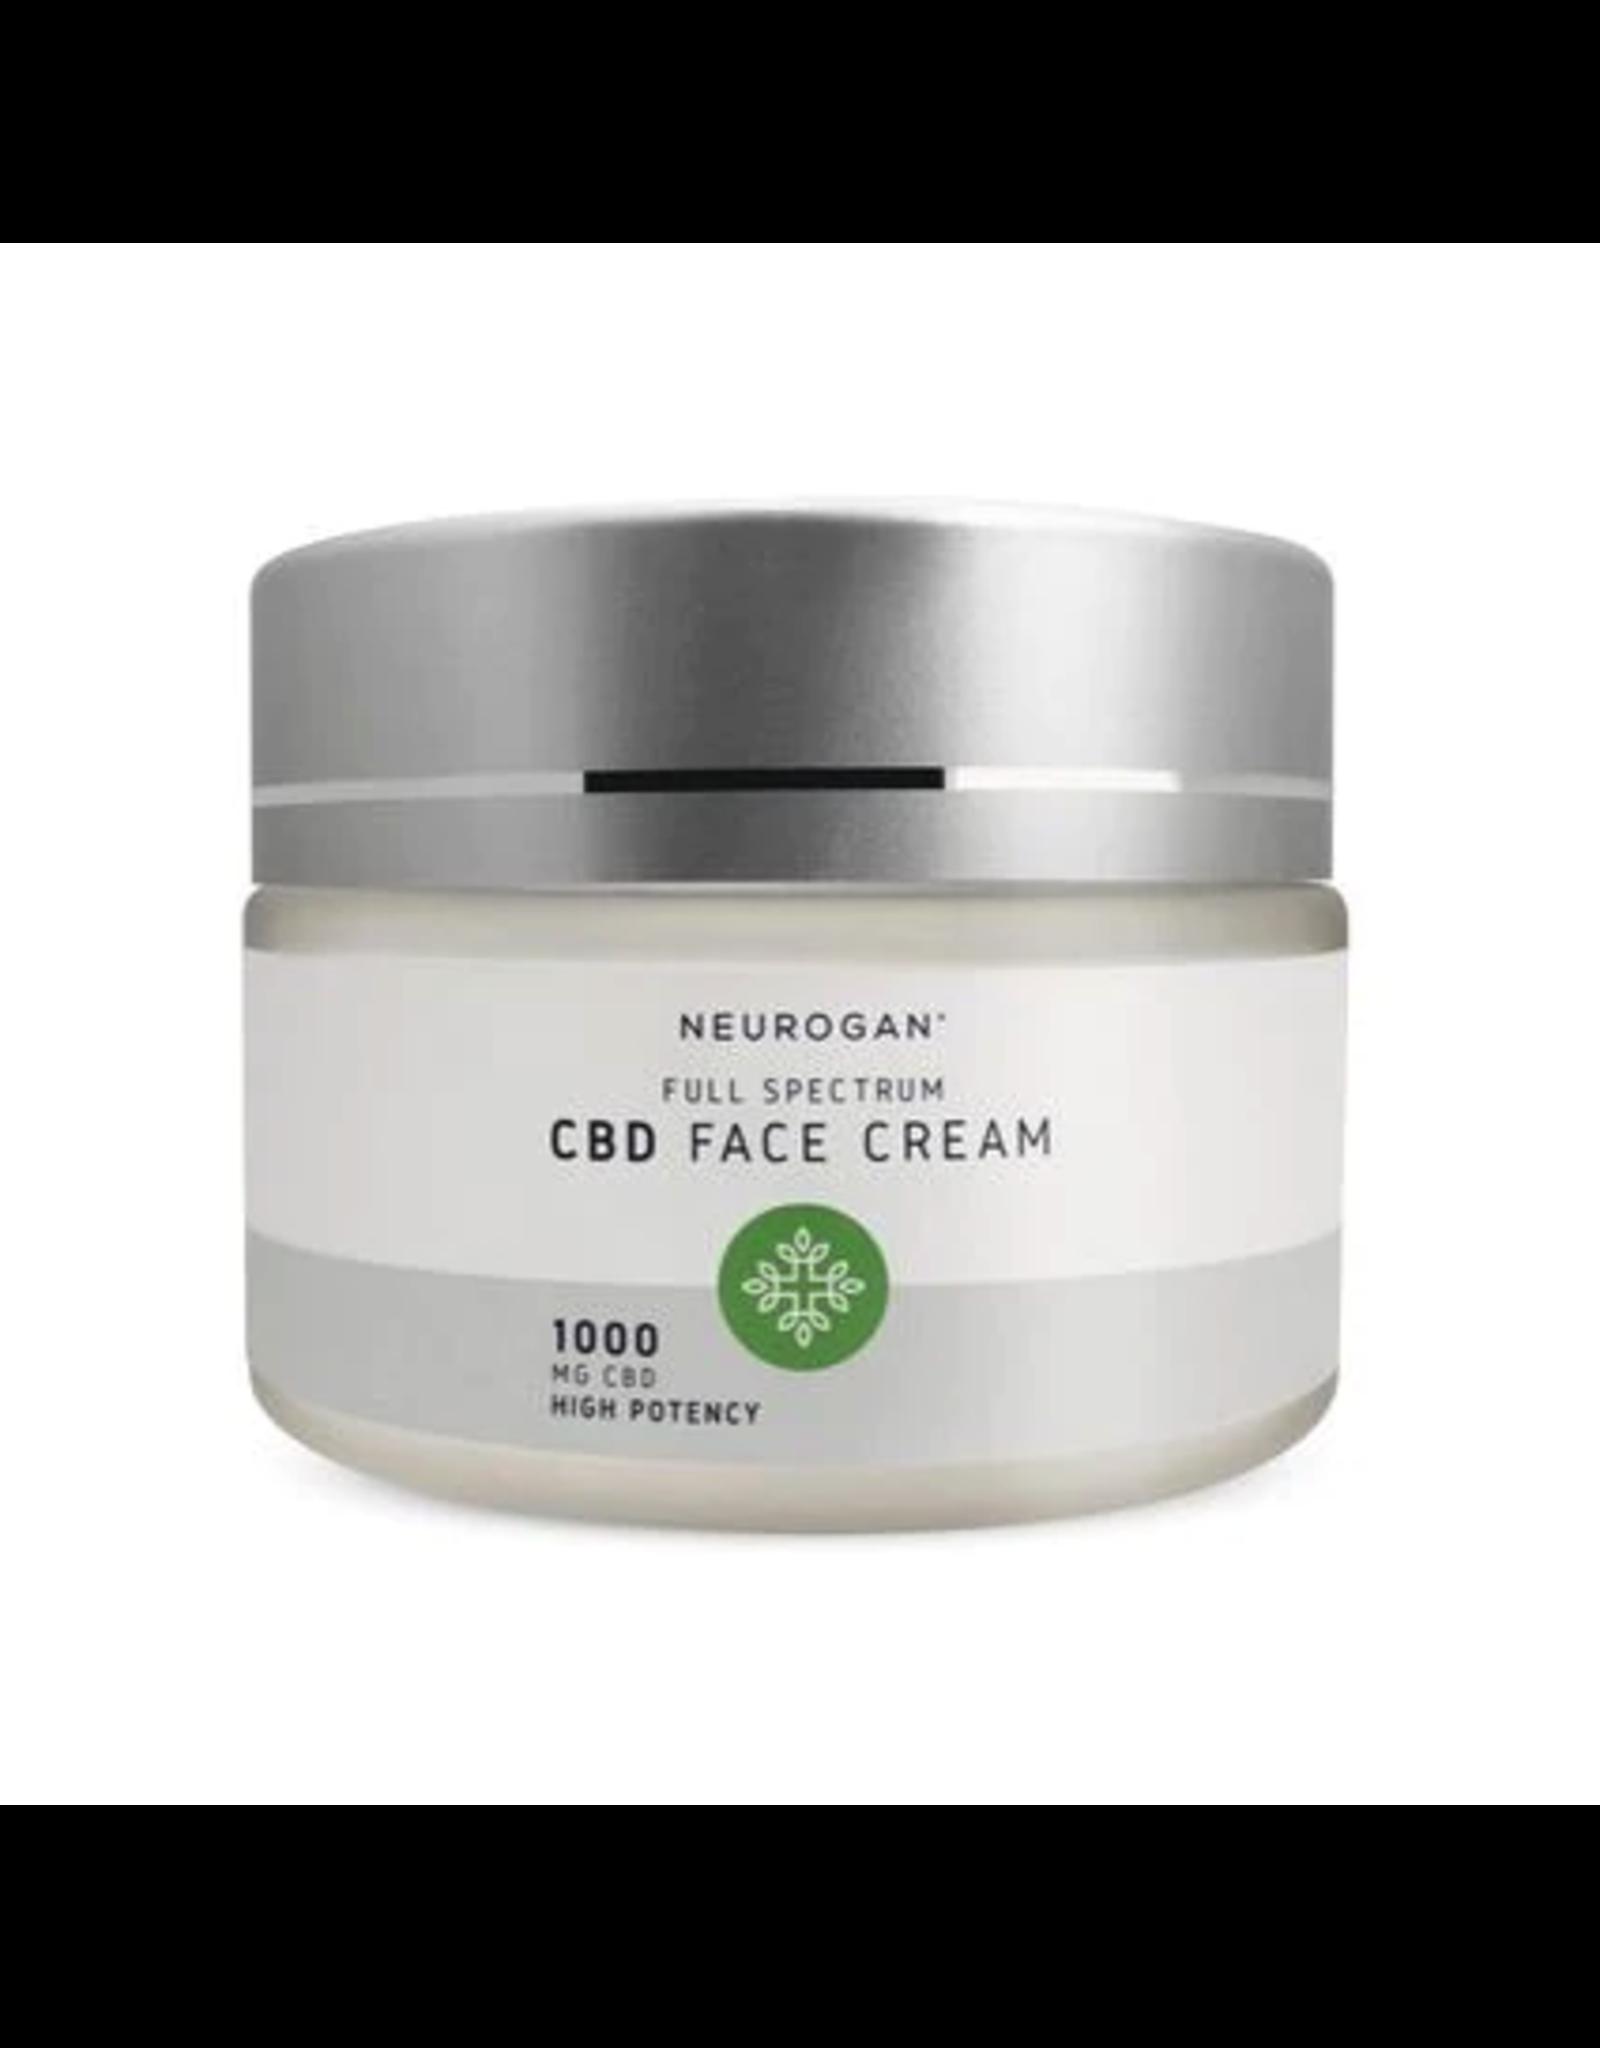 Neurogan Neurogan Full Spectrum CBD Face Cream 1000mg 1oz